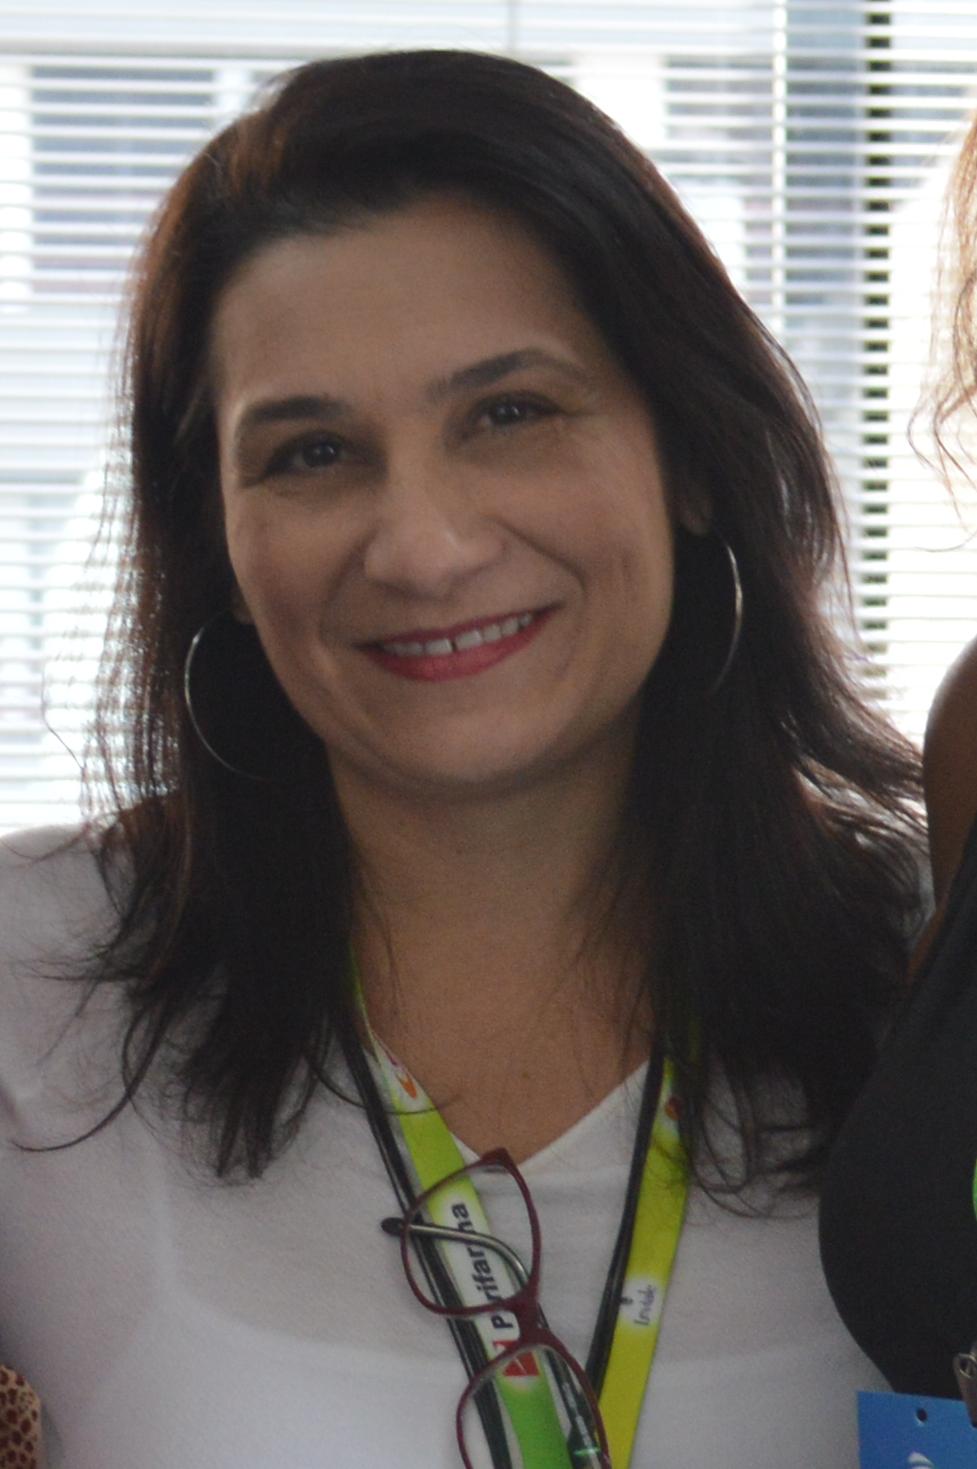 MSc. Raquel Queiroz de Araújo